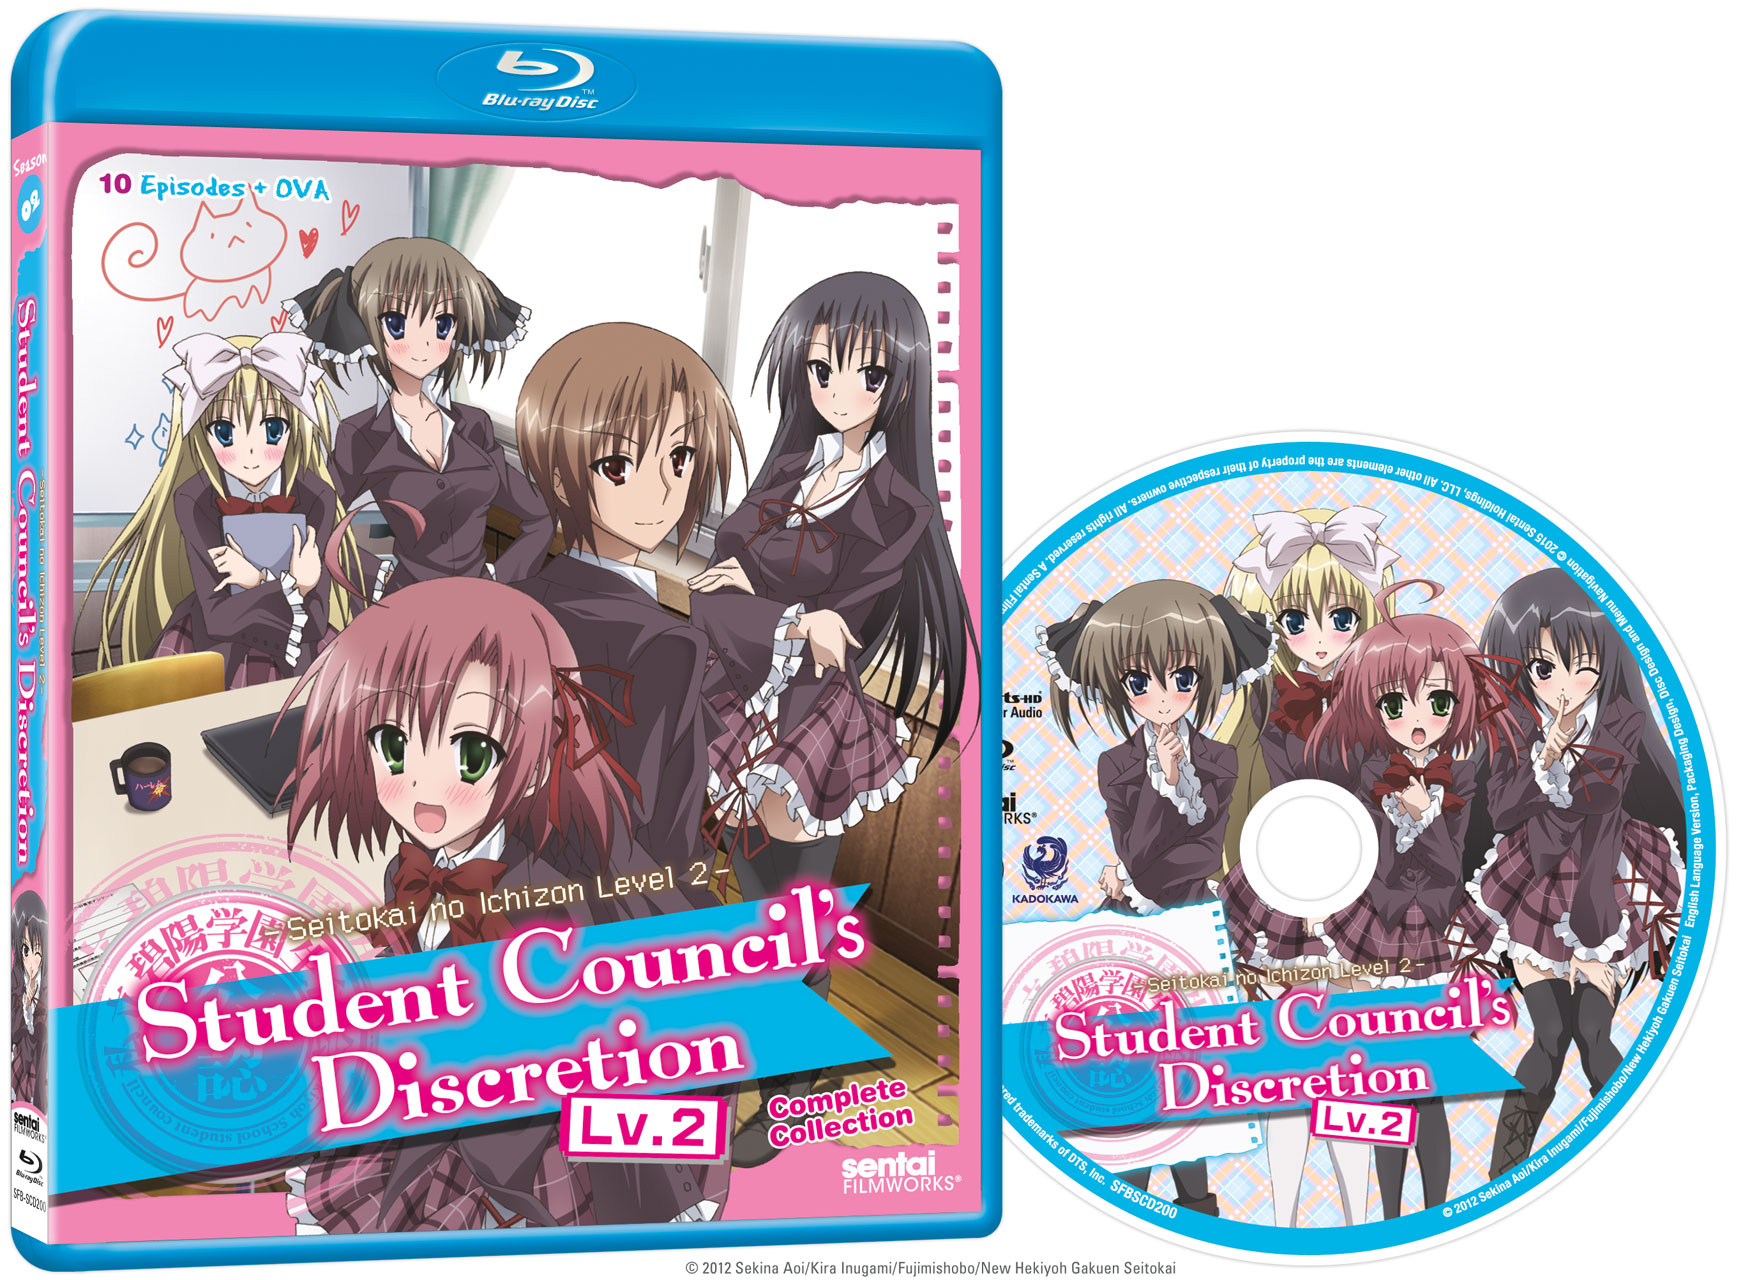 Student Council's Discretion Season 2 Blu-ray